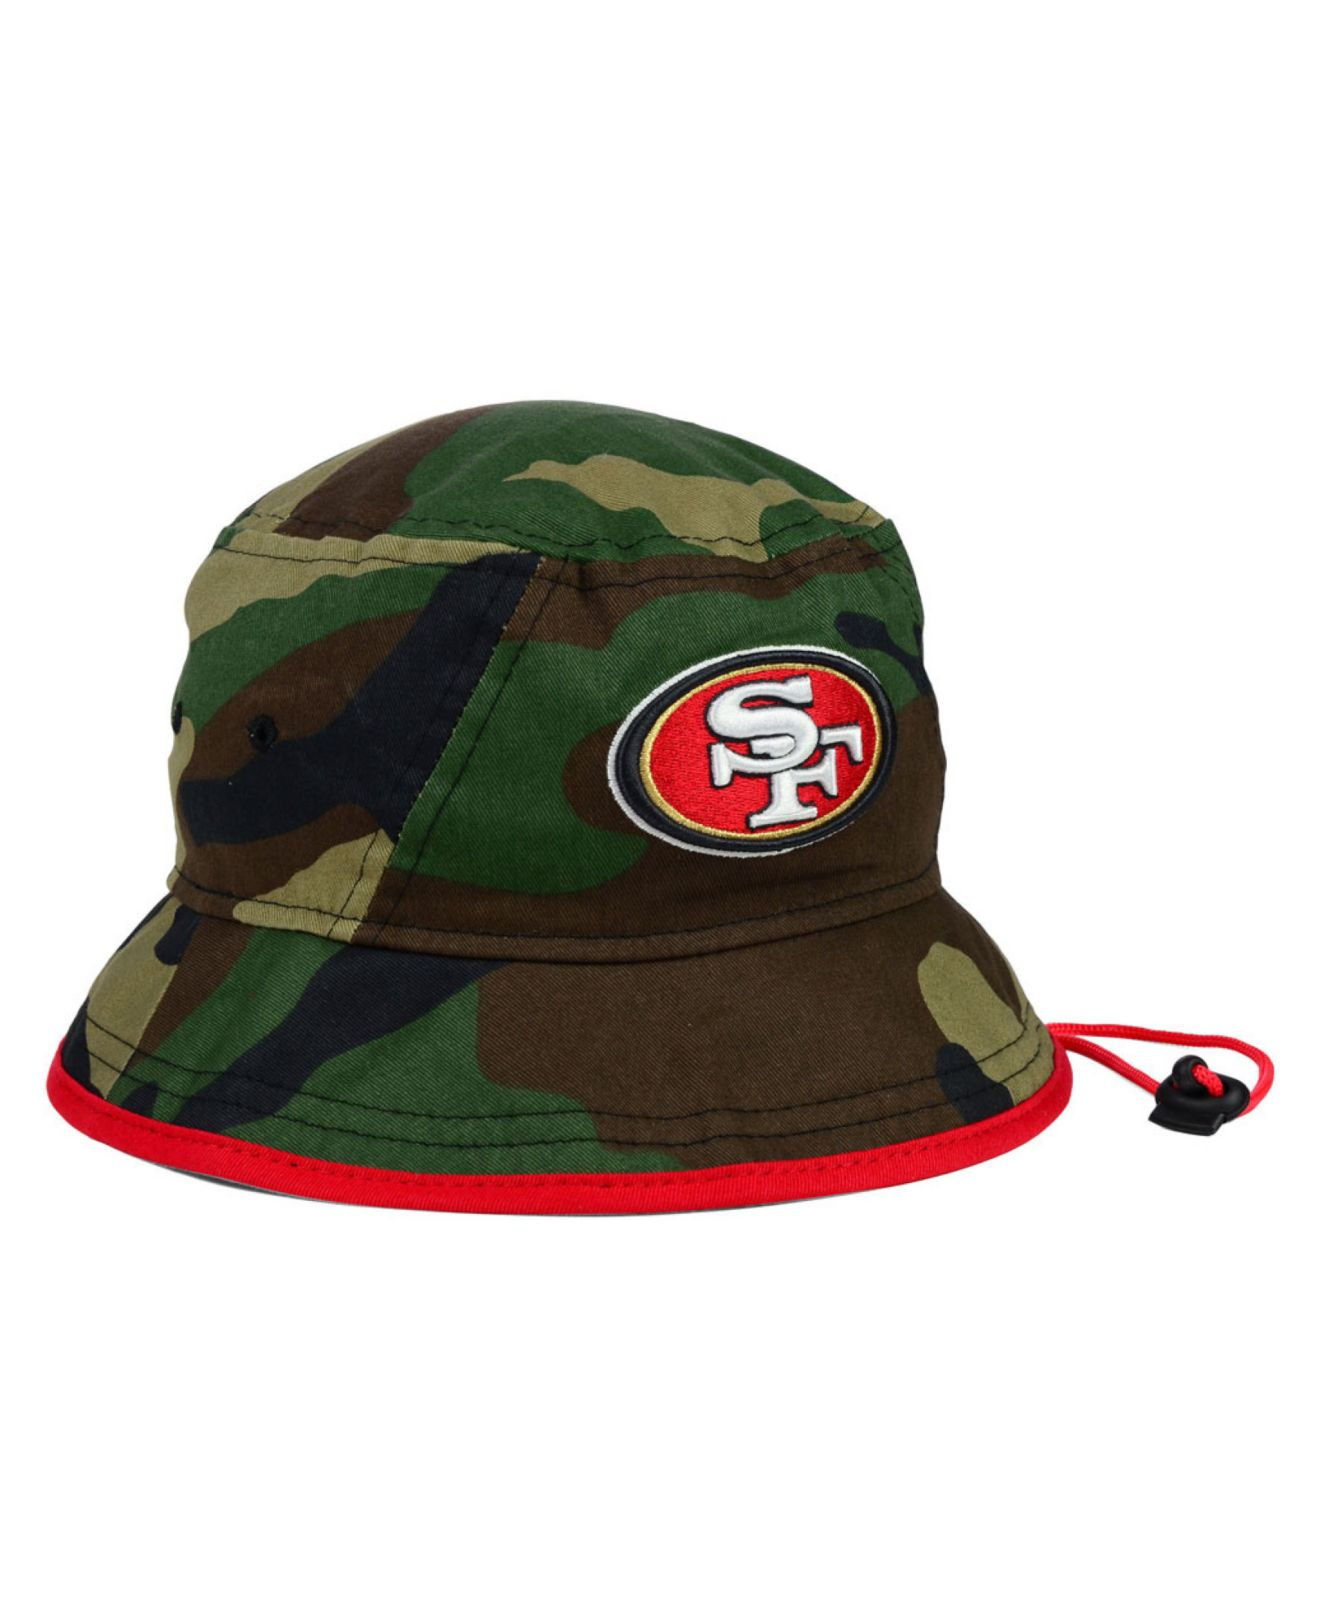 524acfca30d25 ... low cost lyst ktz san francisco 49ers camo pop bucket hat in green for  men fcc34